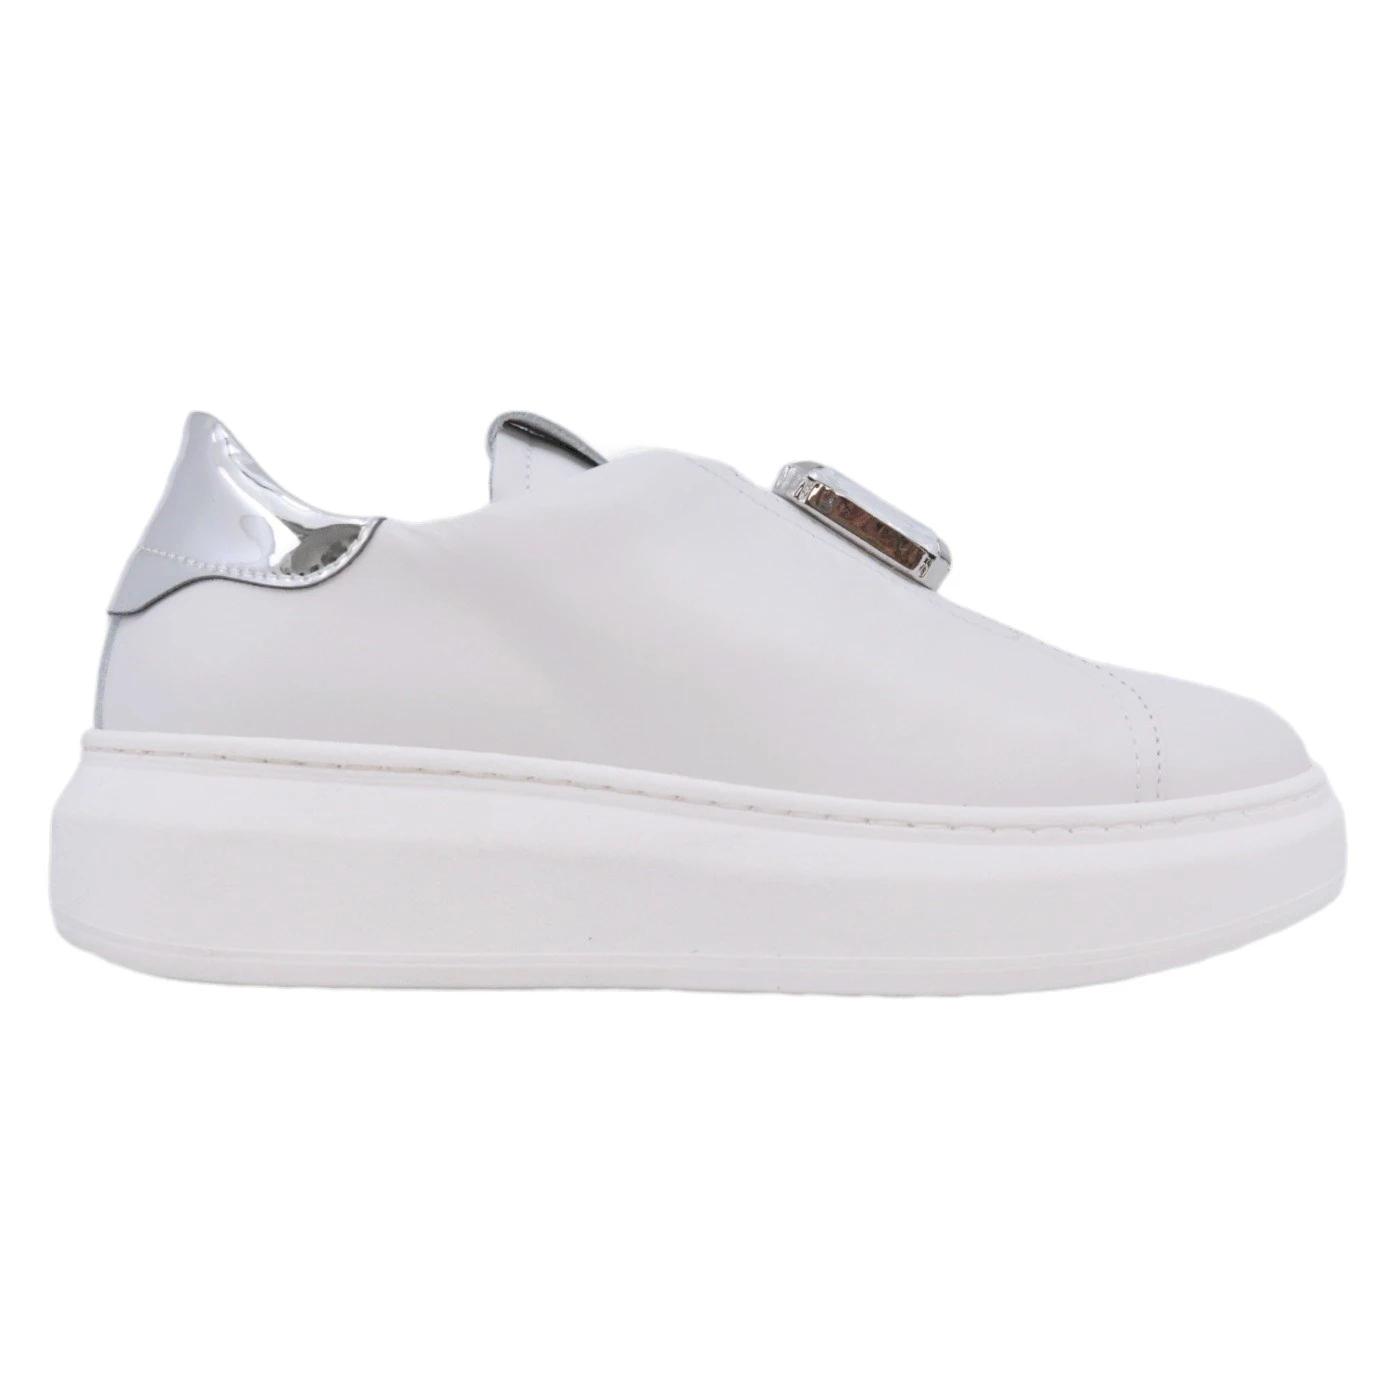 Gio+ G910B Sneaker donna in pelle bianca e argento